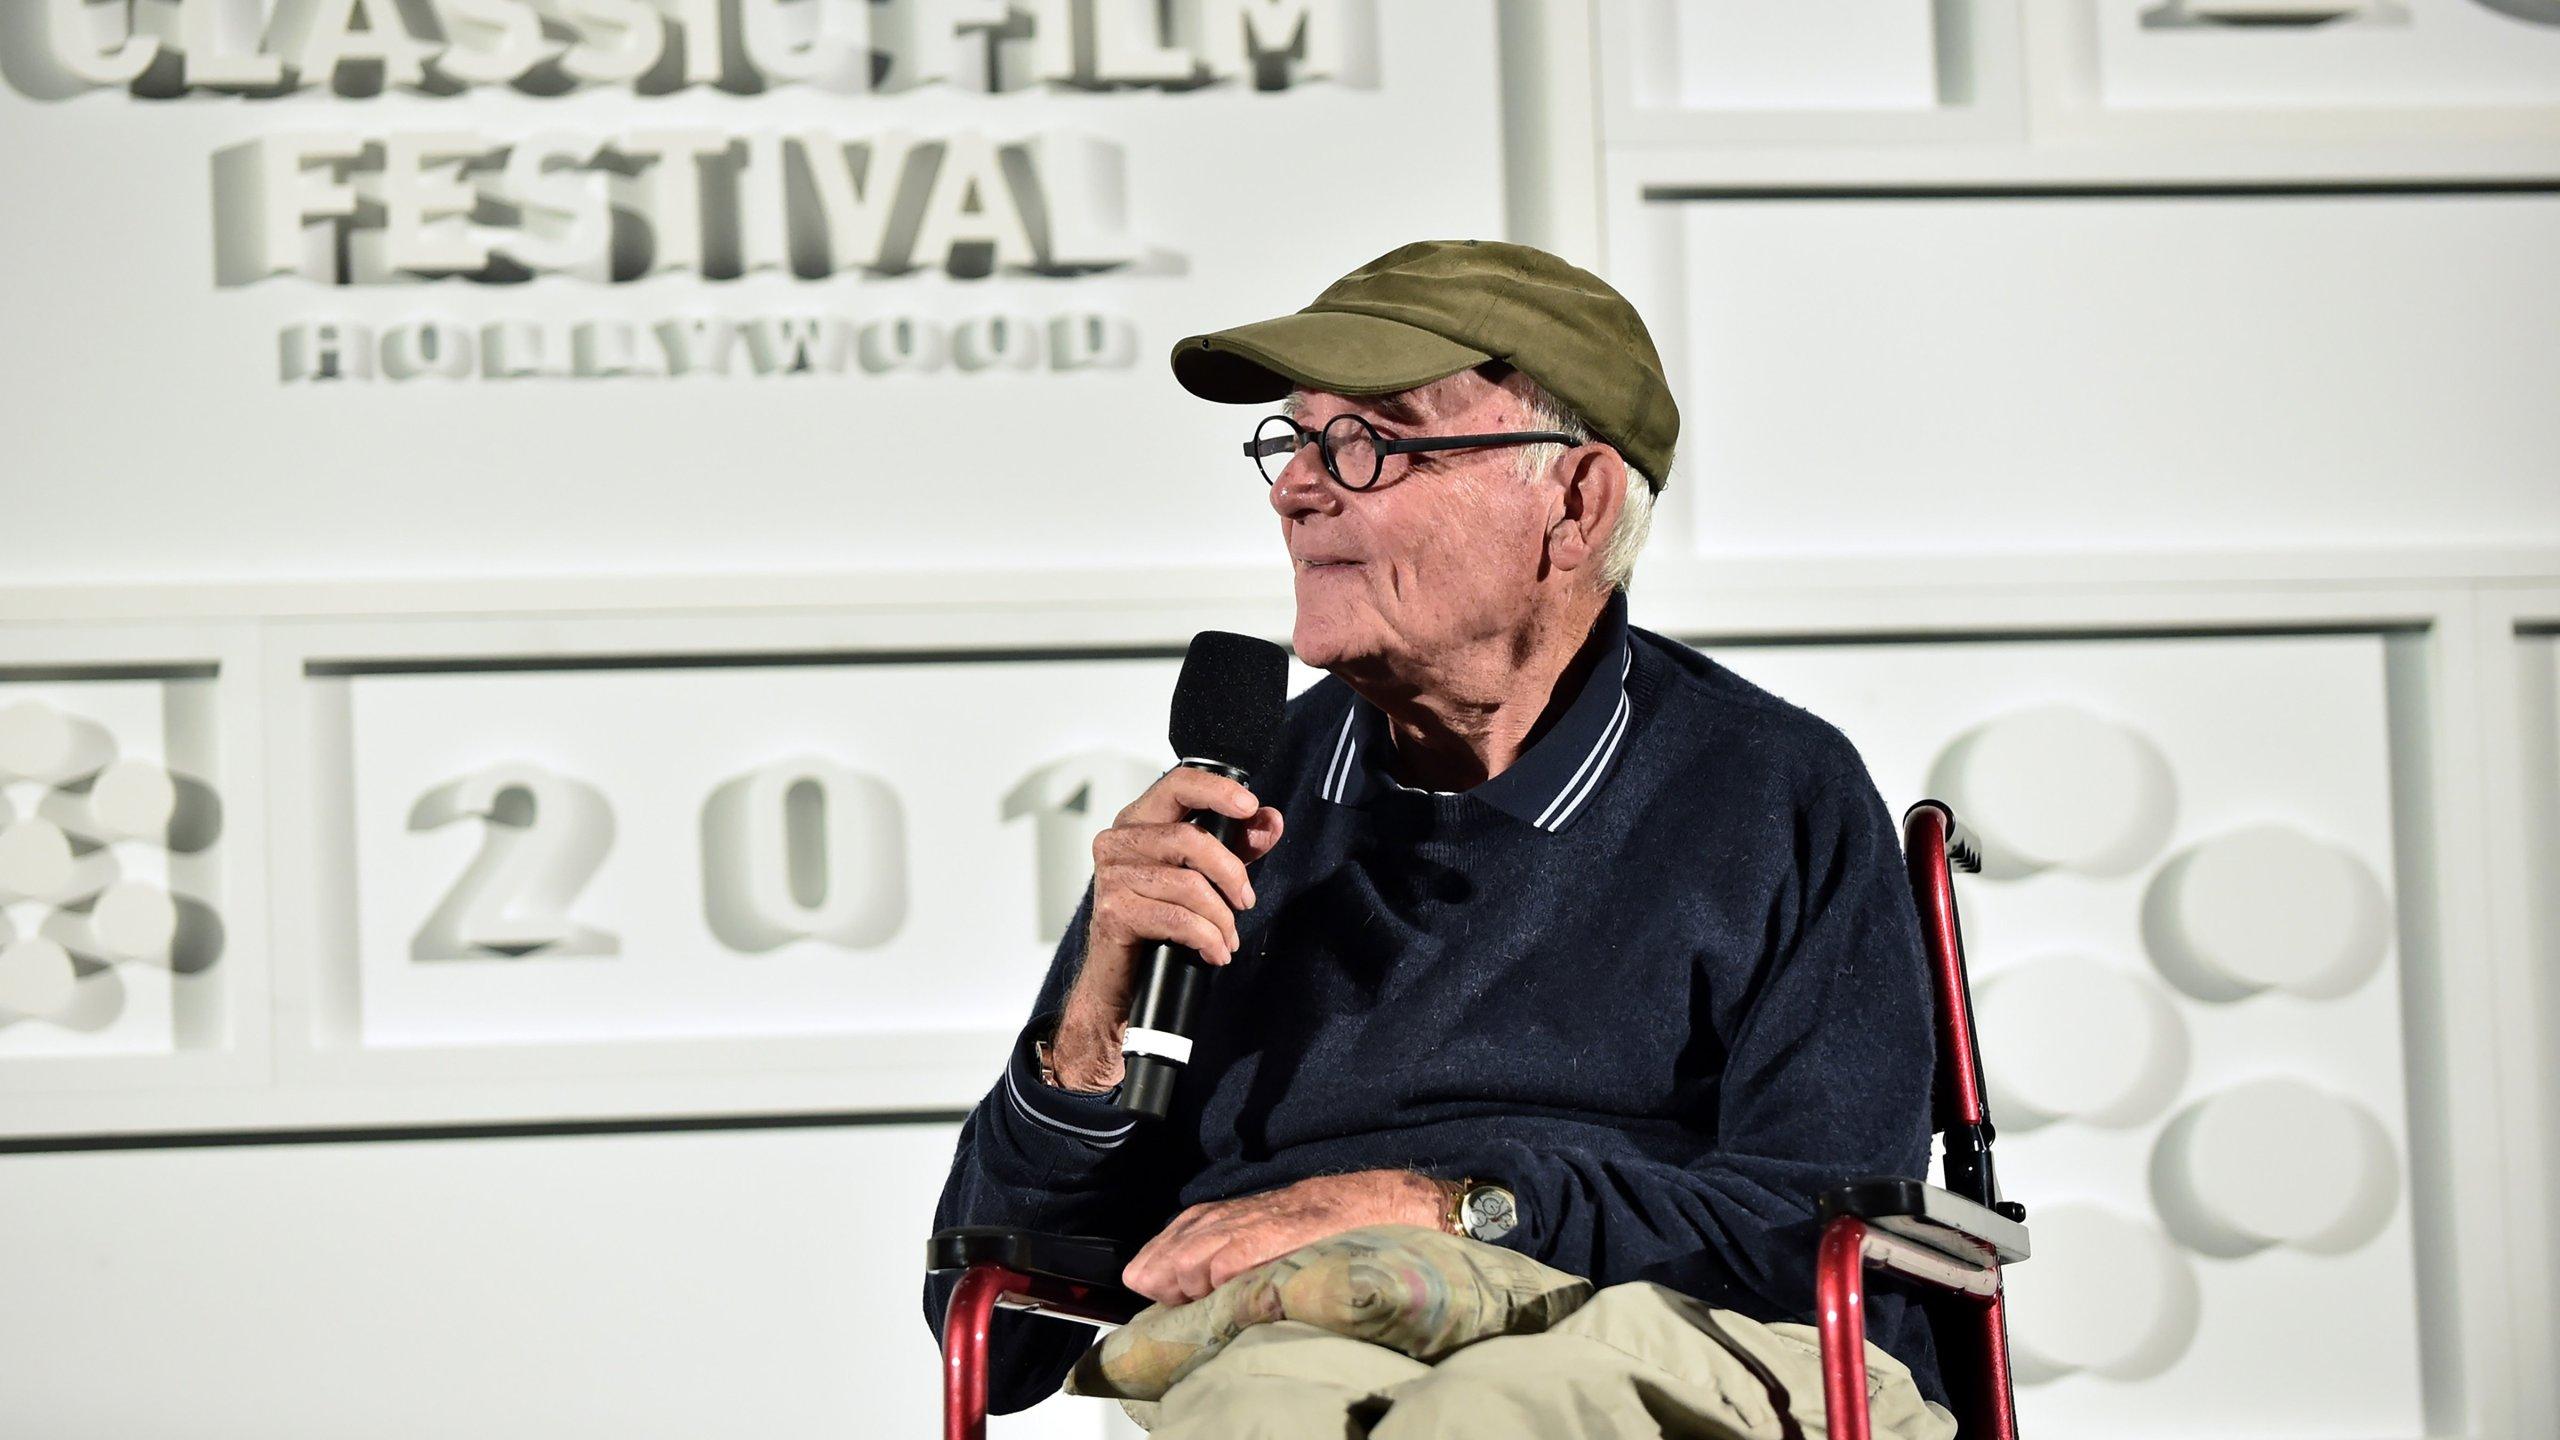 Co creator of Get Smart Buck Henry dies at 89 fox5sandiegocom 2560x1440